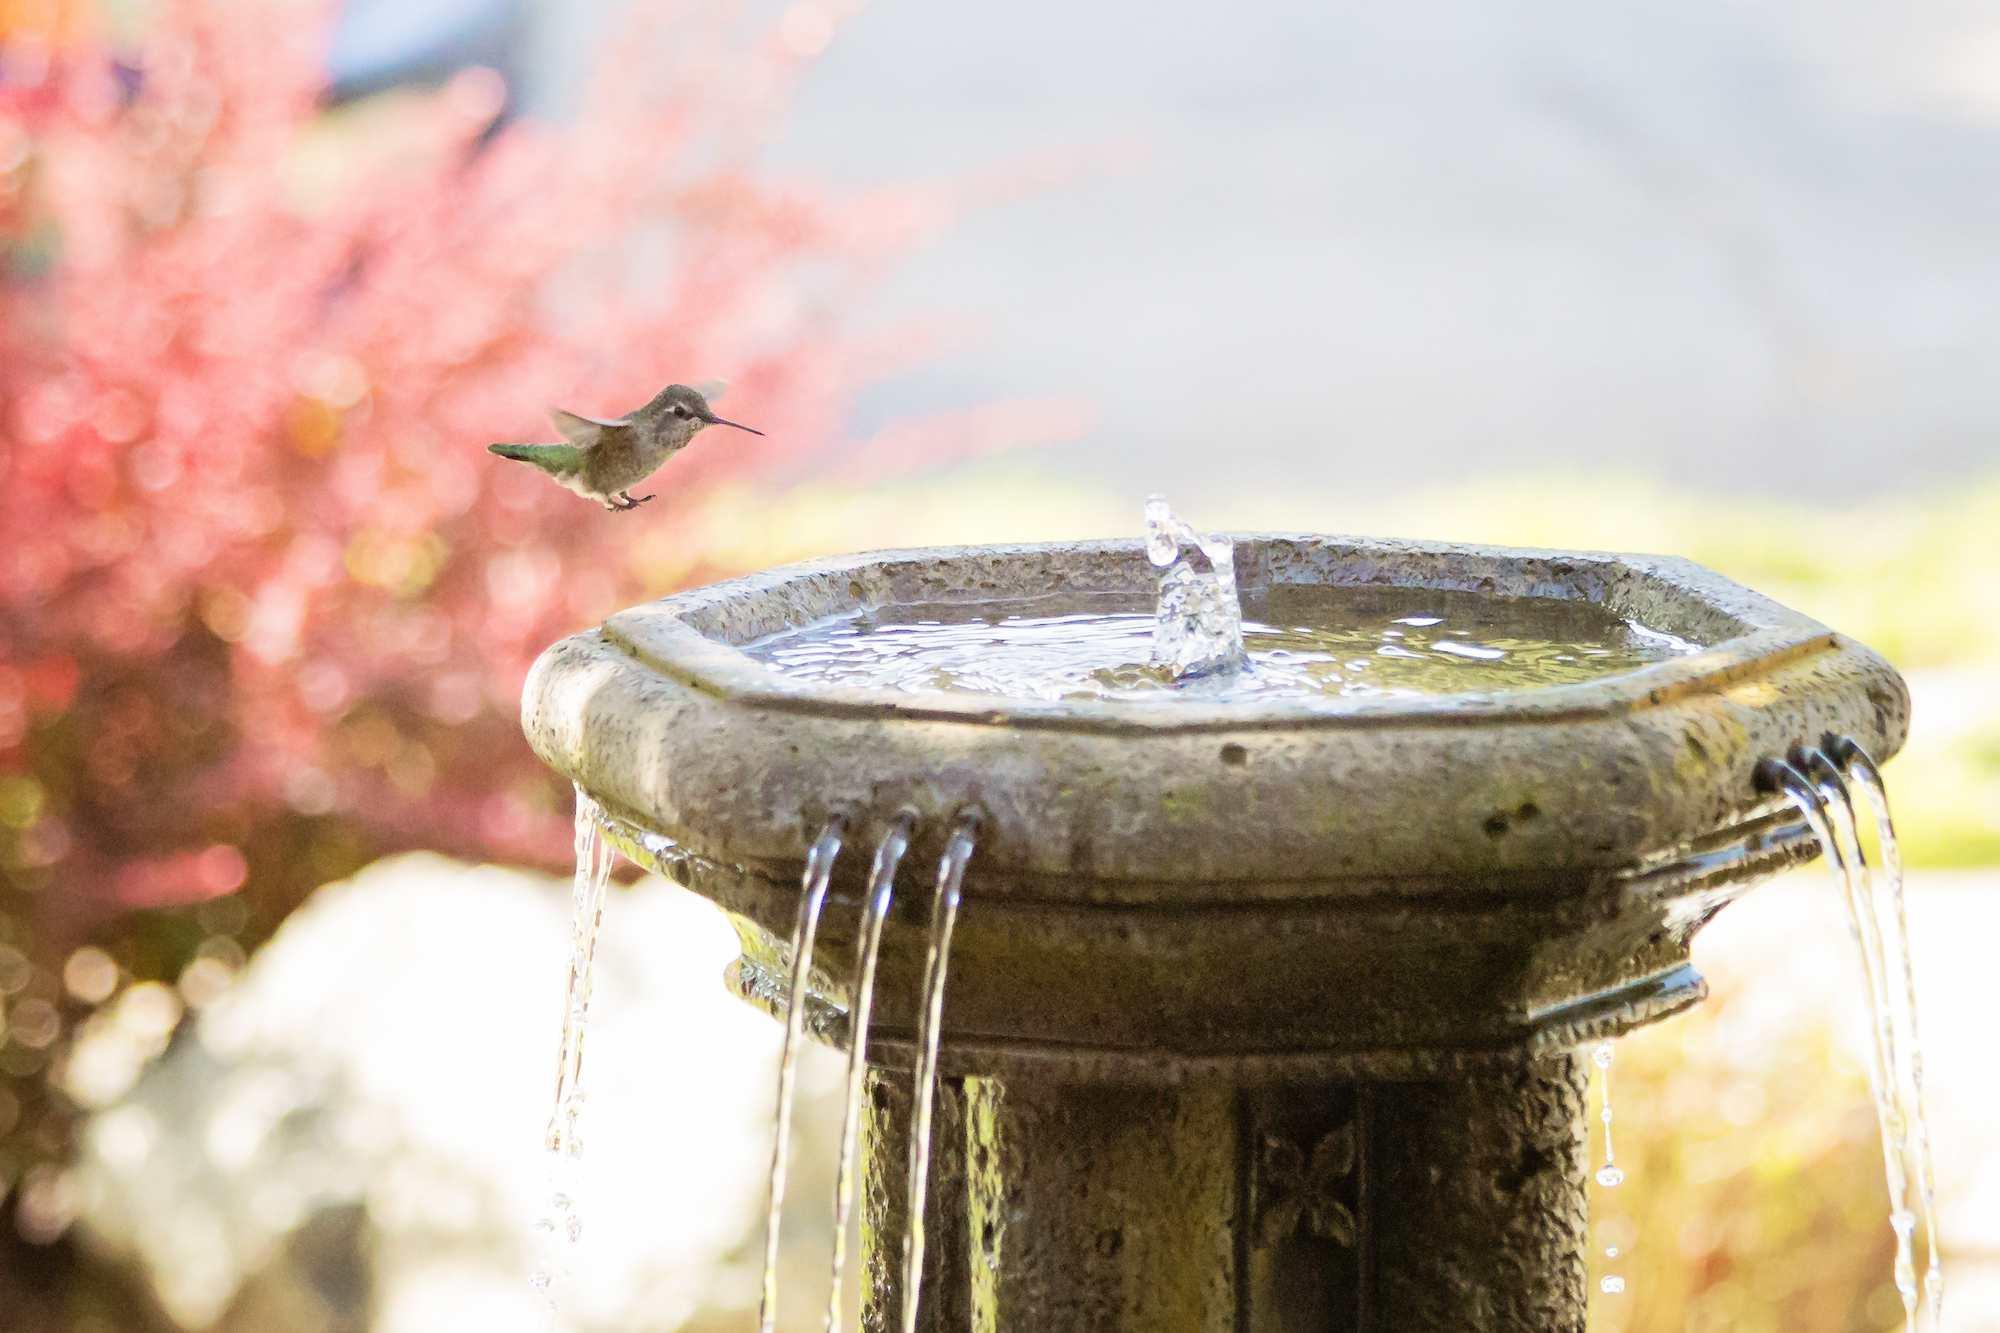 Hummingbird landing on a fountain